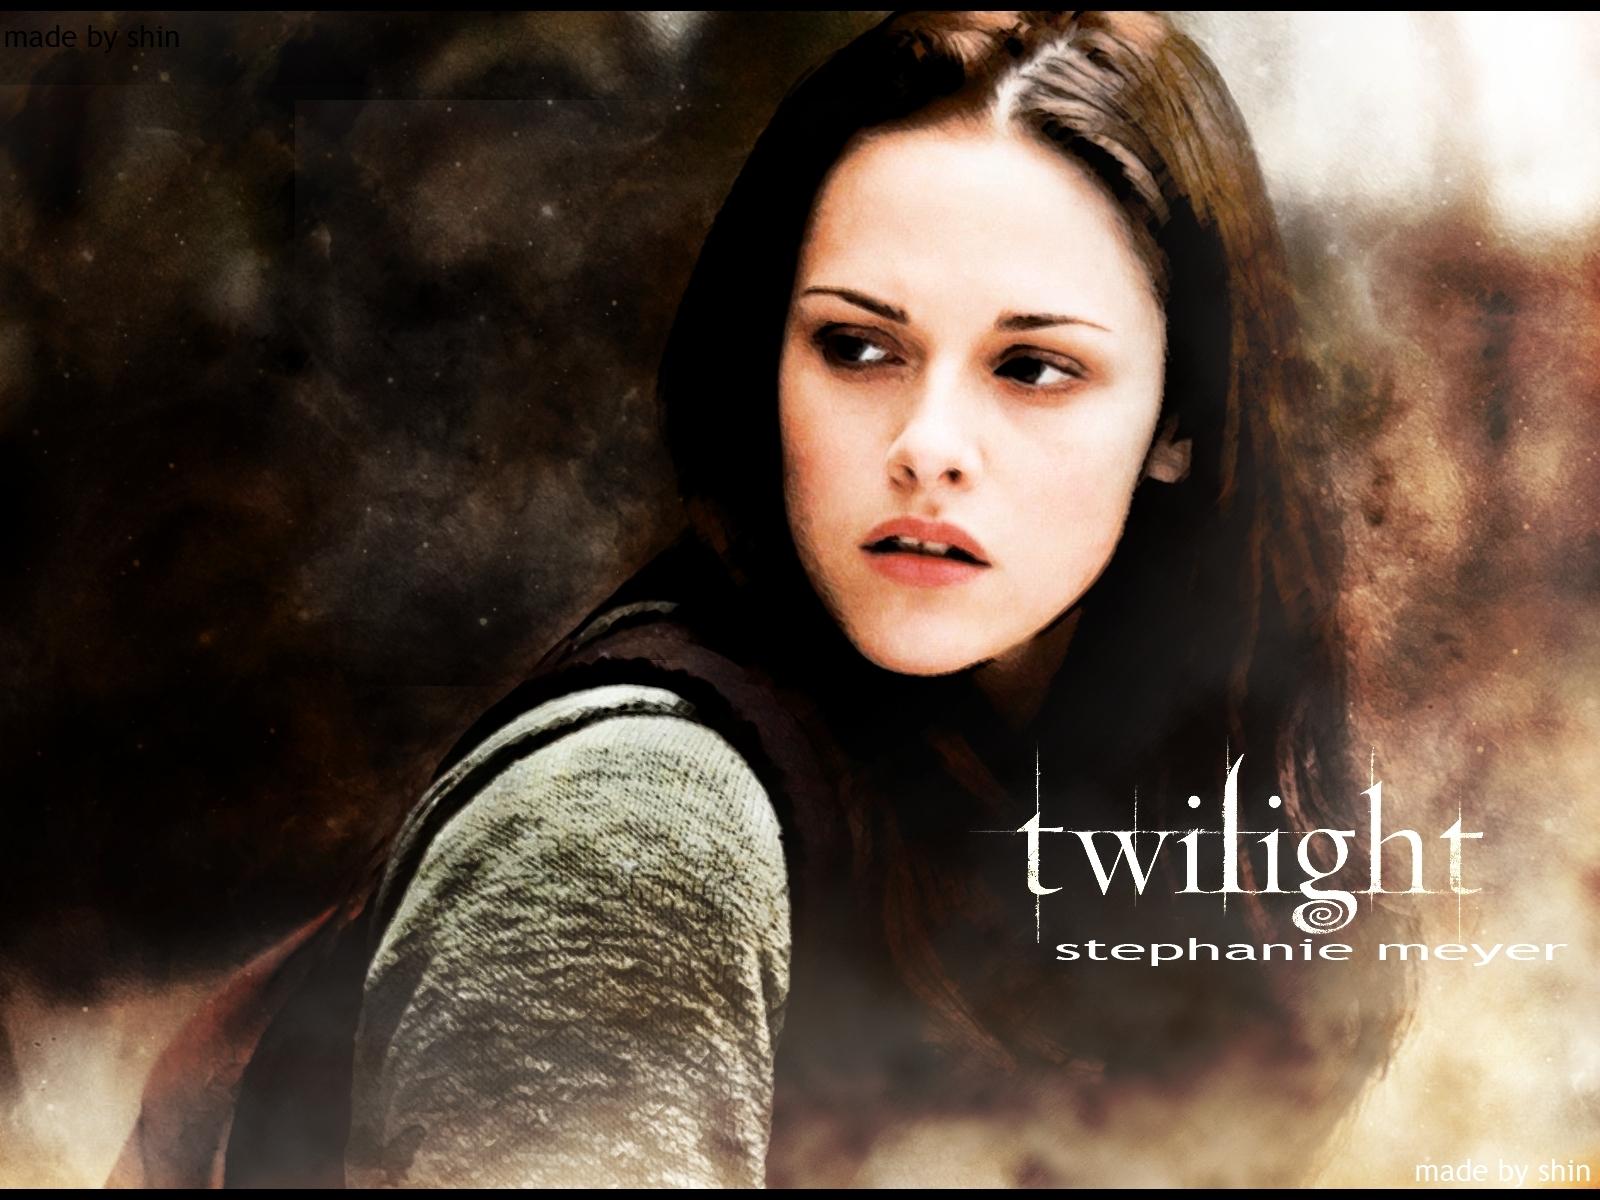 http://3.bp.blogspot.com/-87r3z3fHGnw/UQZG-zSd6fI/AAAAAAAABOg/VqMncWnvivo/s1600/twilight+poster_6.jpg